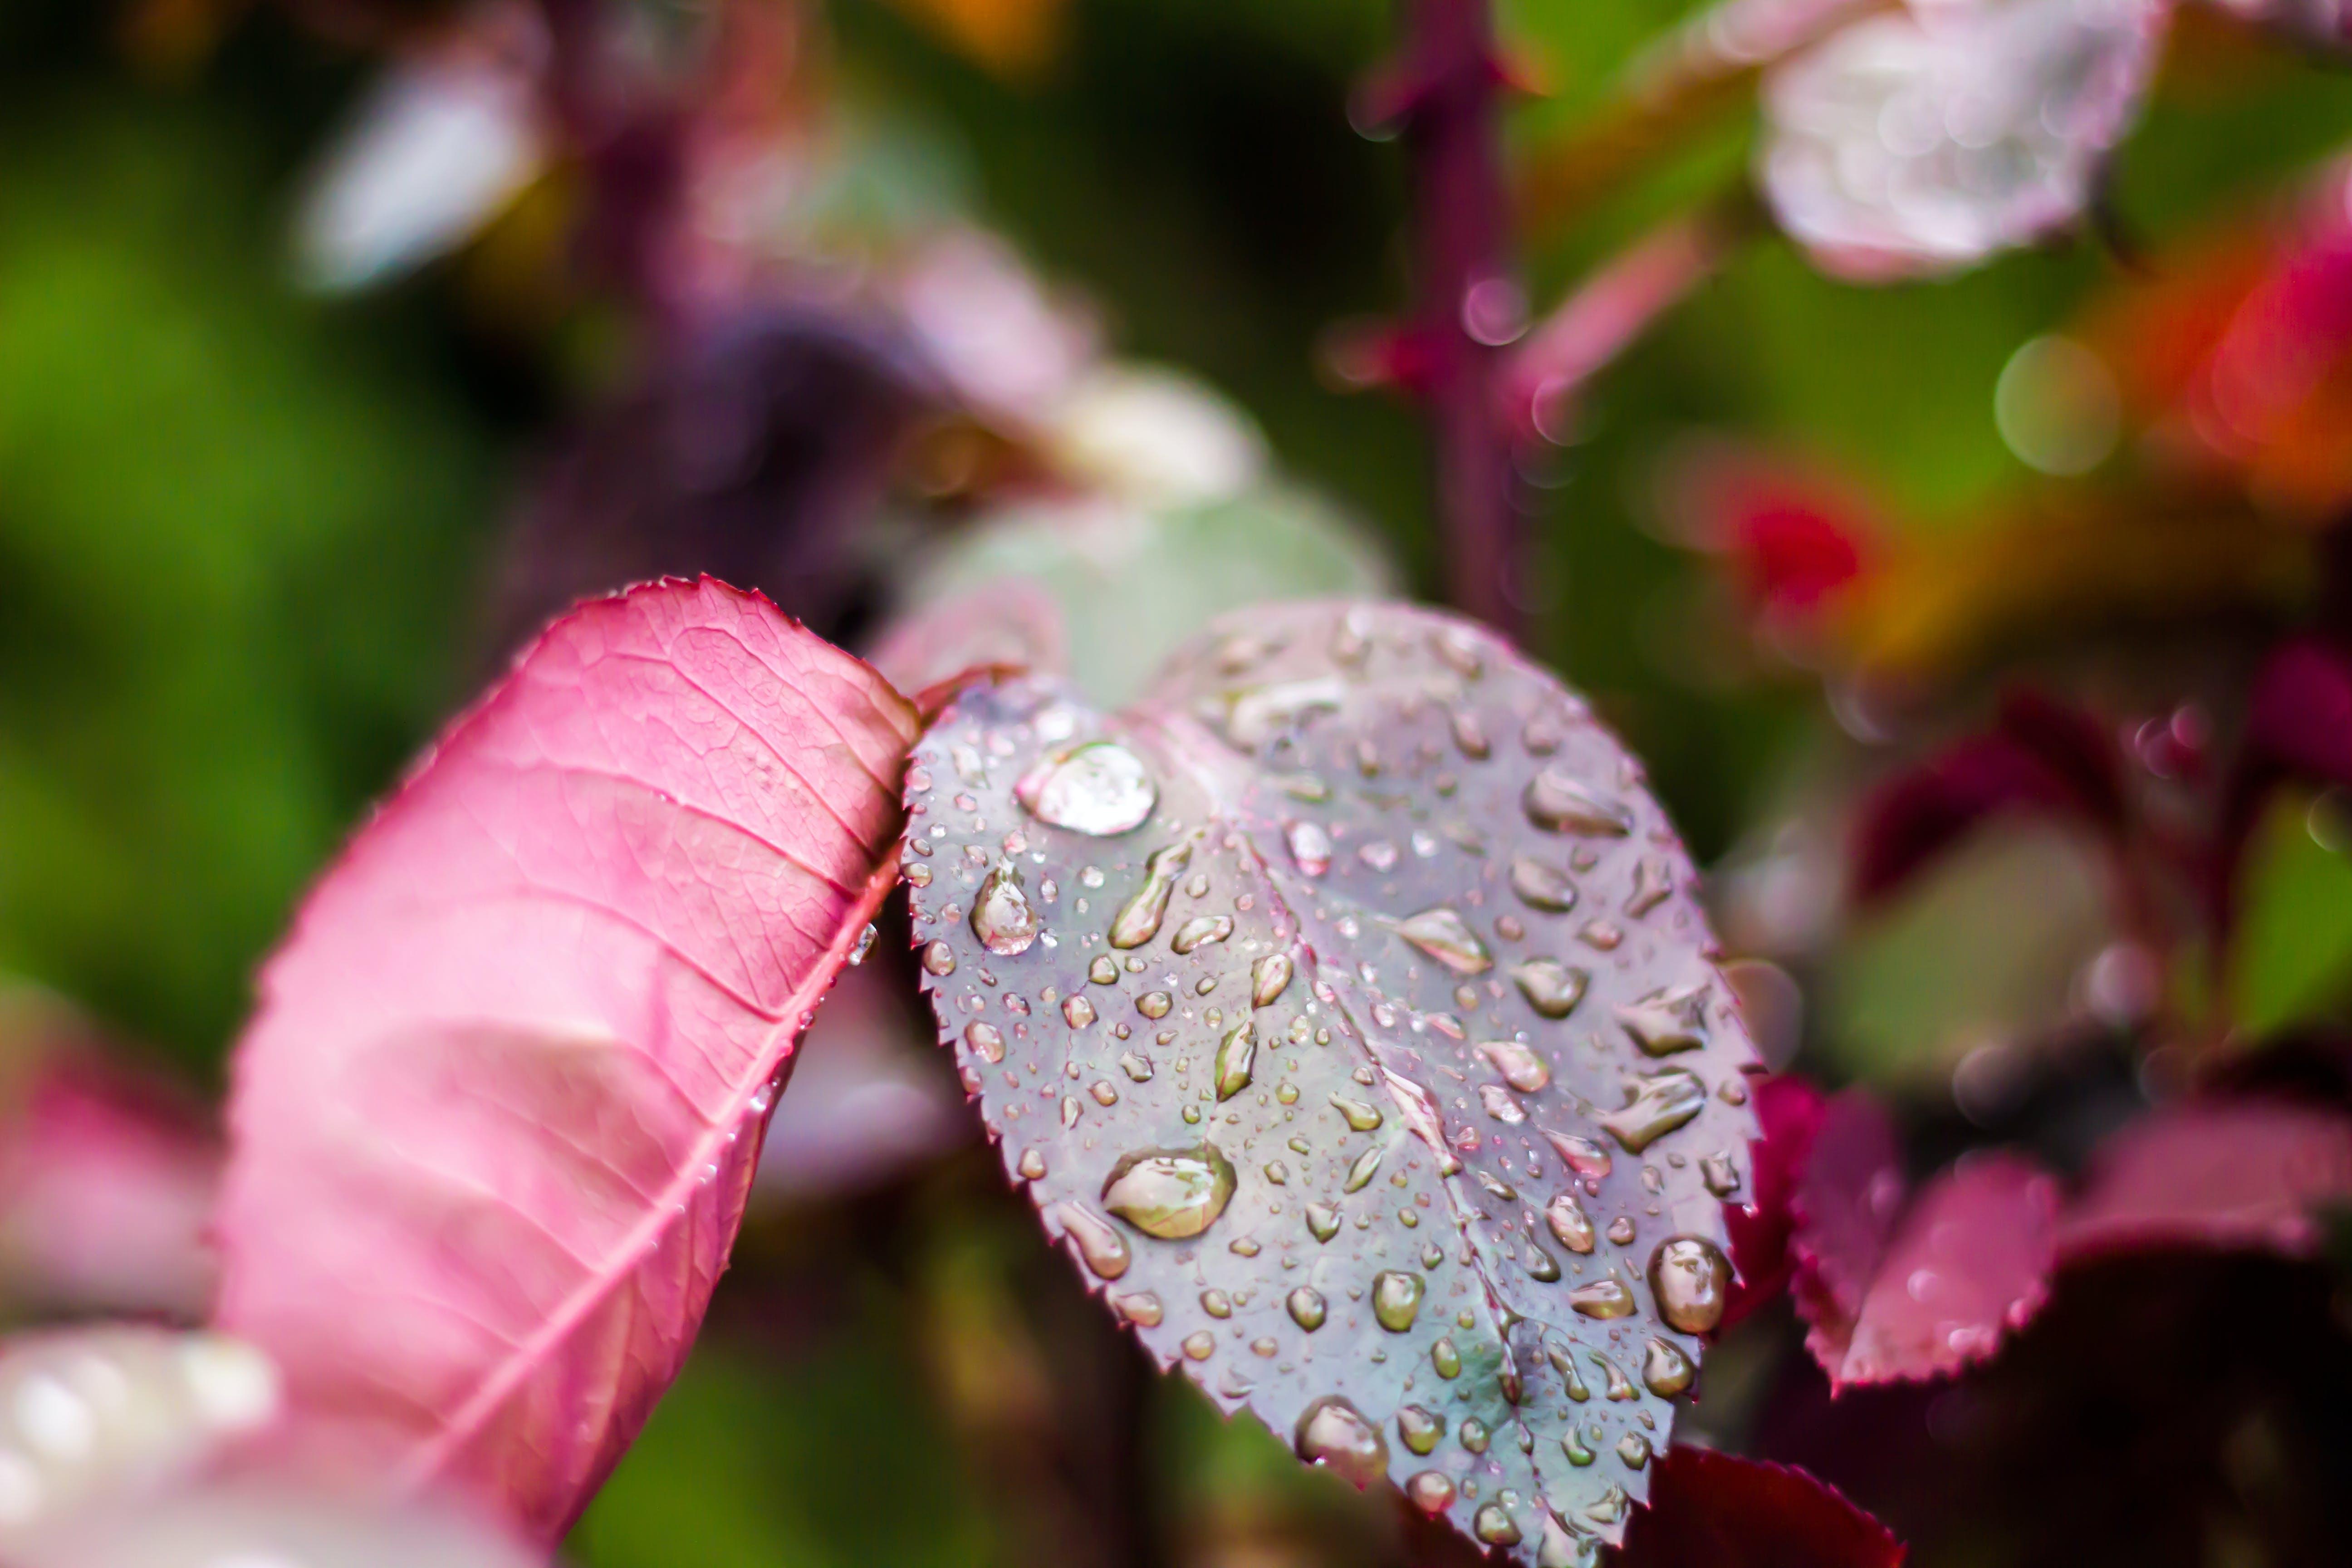 Kostenloses Stock Foto zu natur, regen, farbe, rose